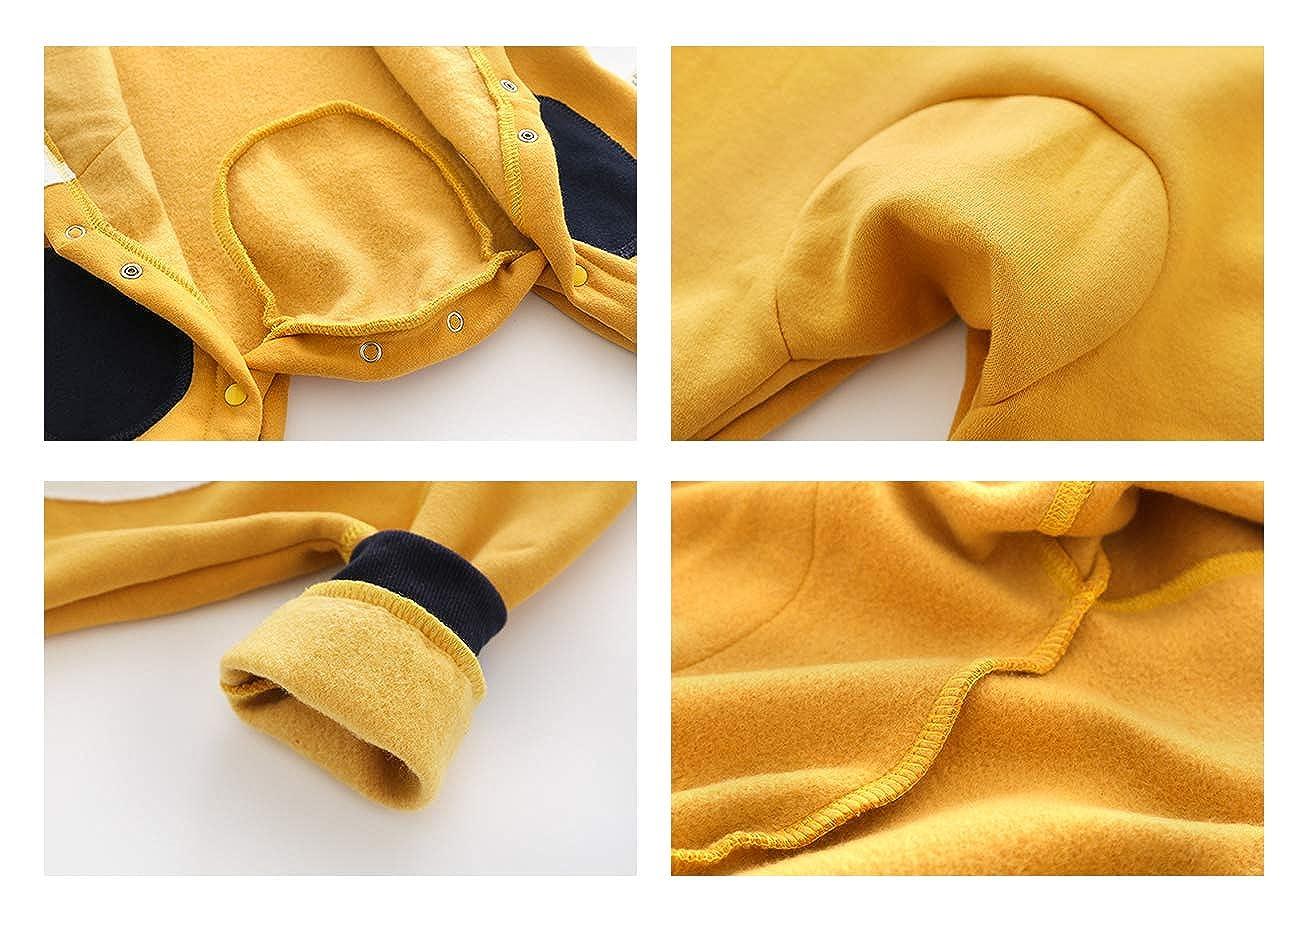 Milkiwai Newborn Baby Fleece Warm Cartoon Cotton Romper Jumpsuit Hood Outerwear